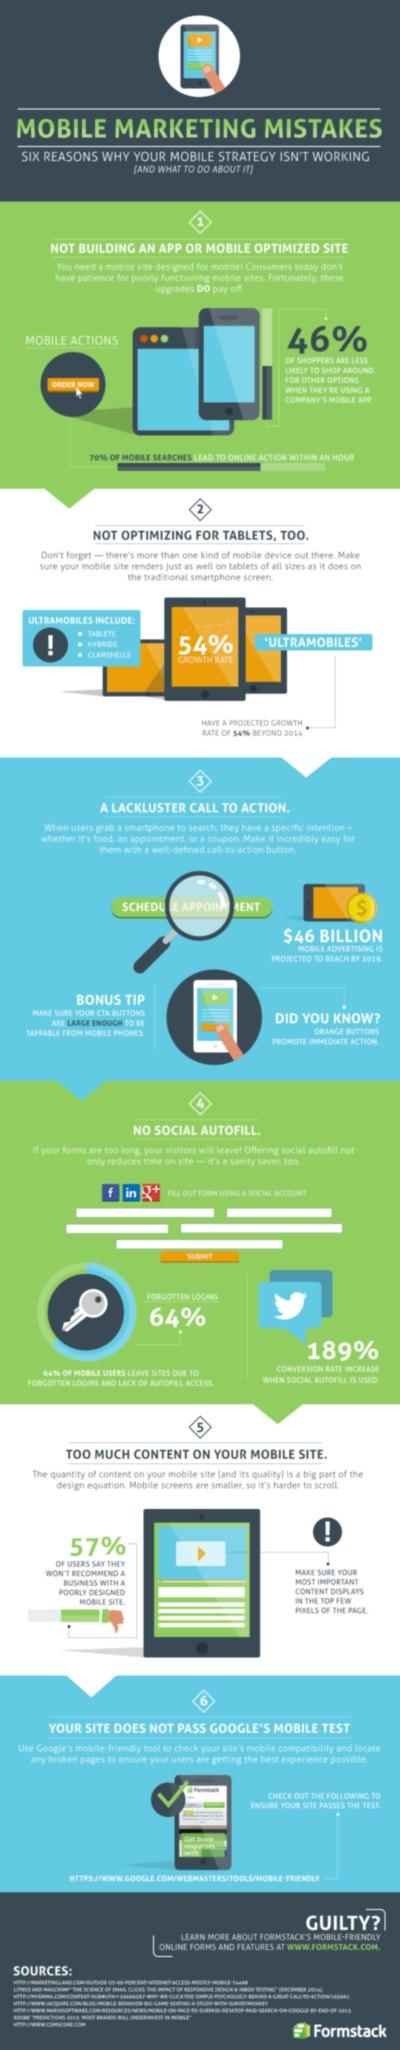 Mobilegeddon Infographic